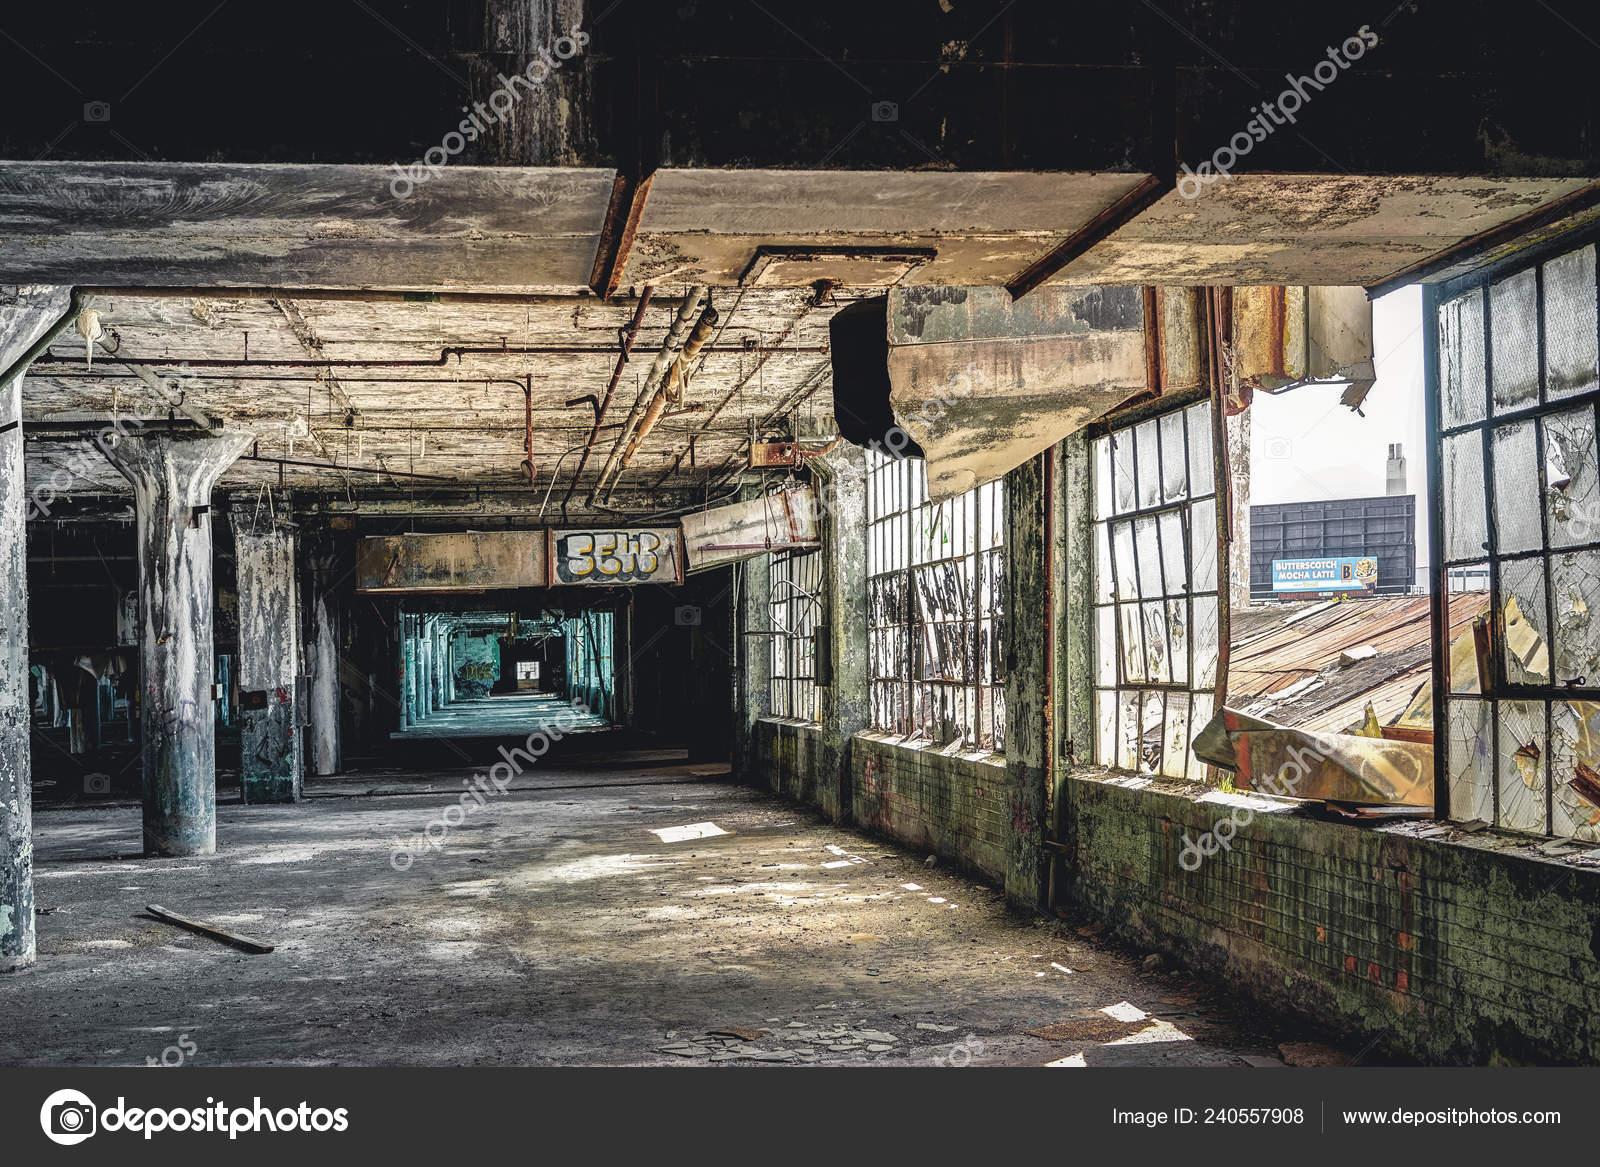 incontri Detroit